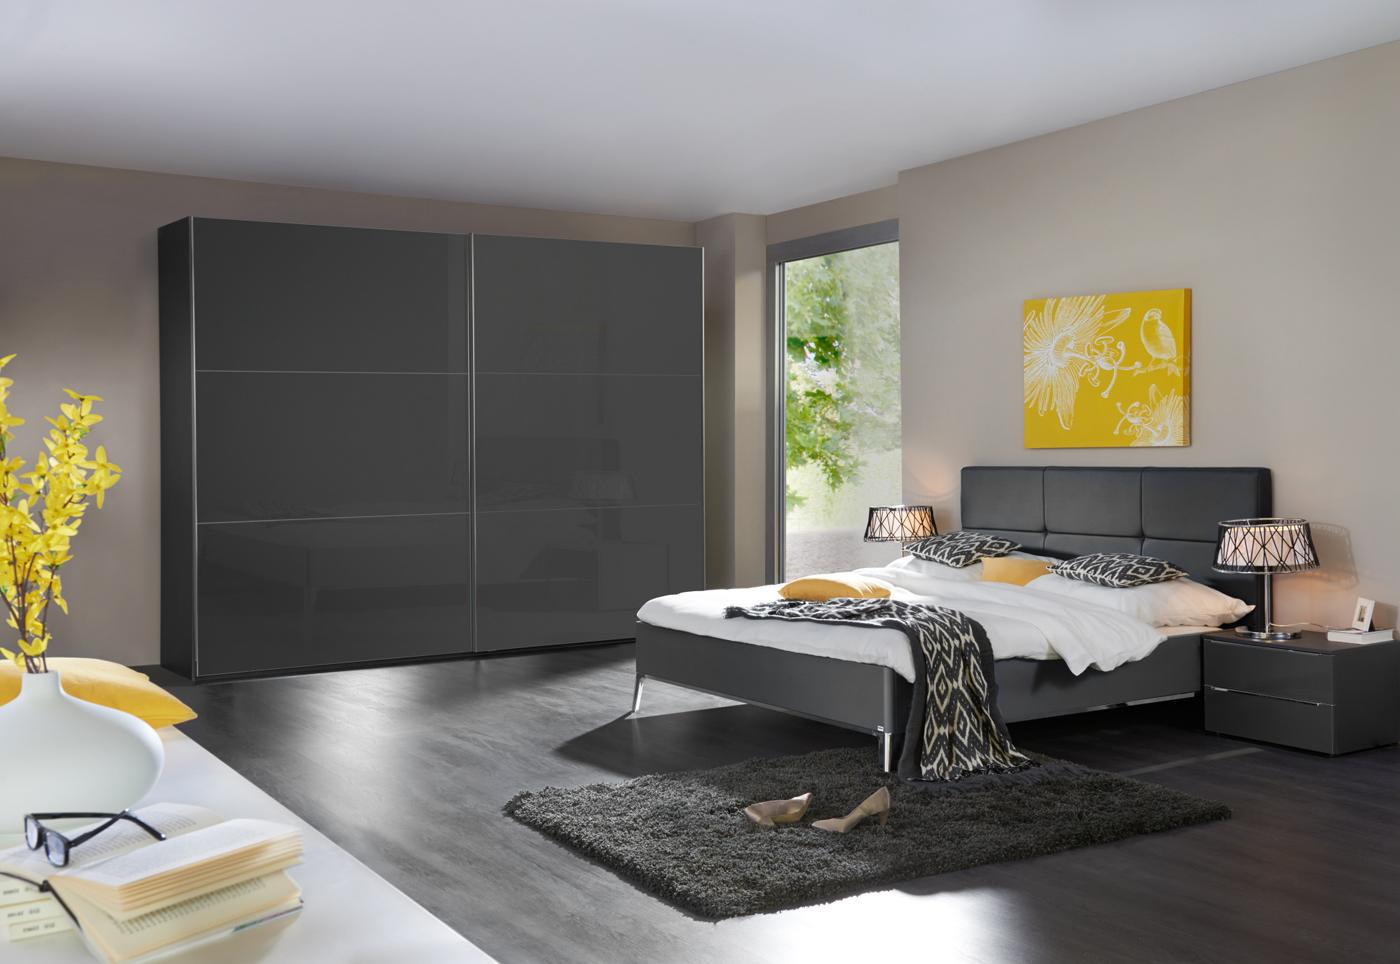 slaapkamer tokio - herraets slapen, Deco ideeën